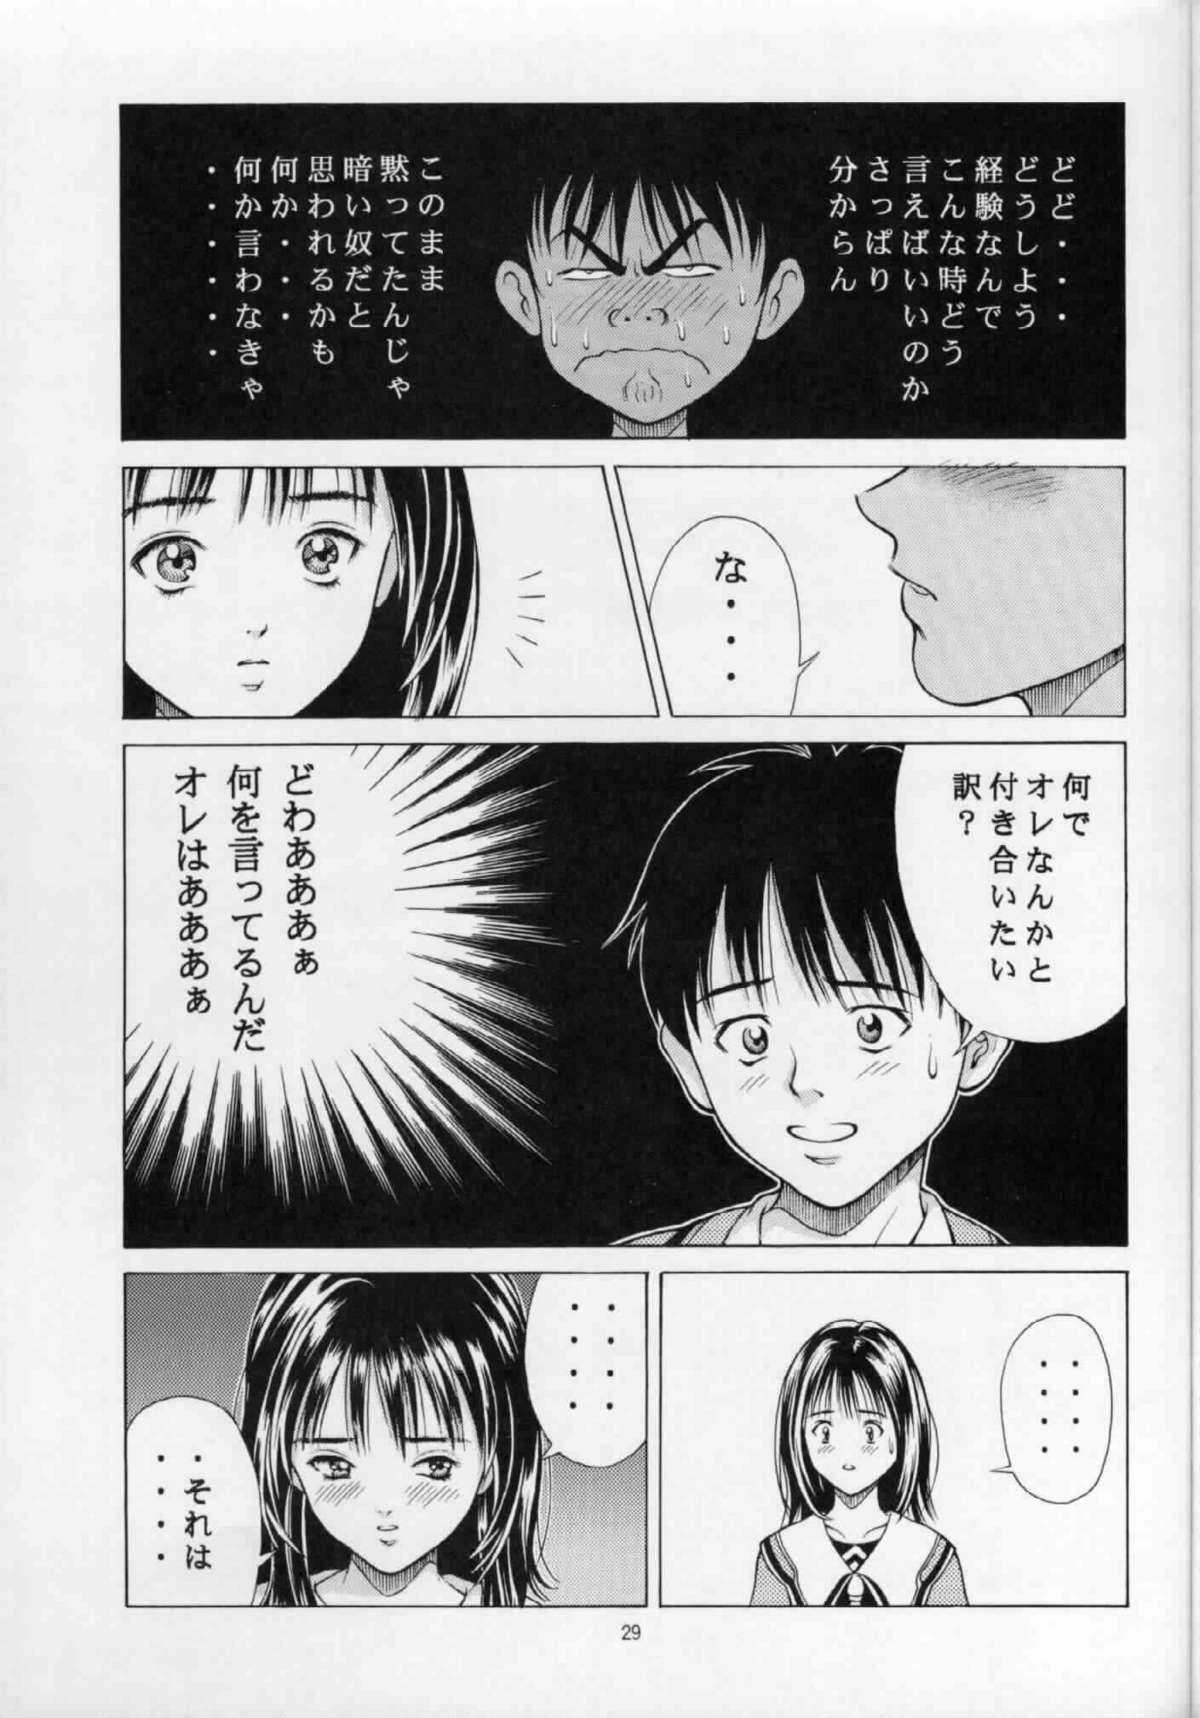 Fuwafuwarin 27